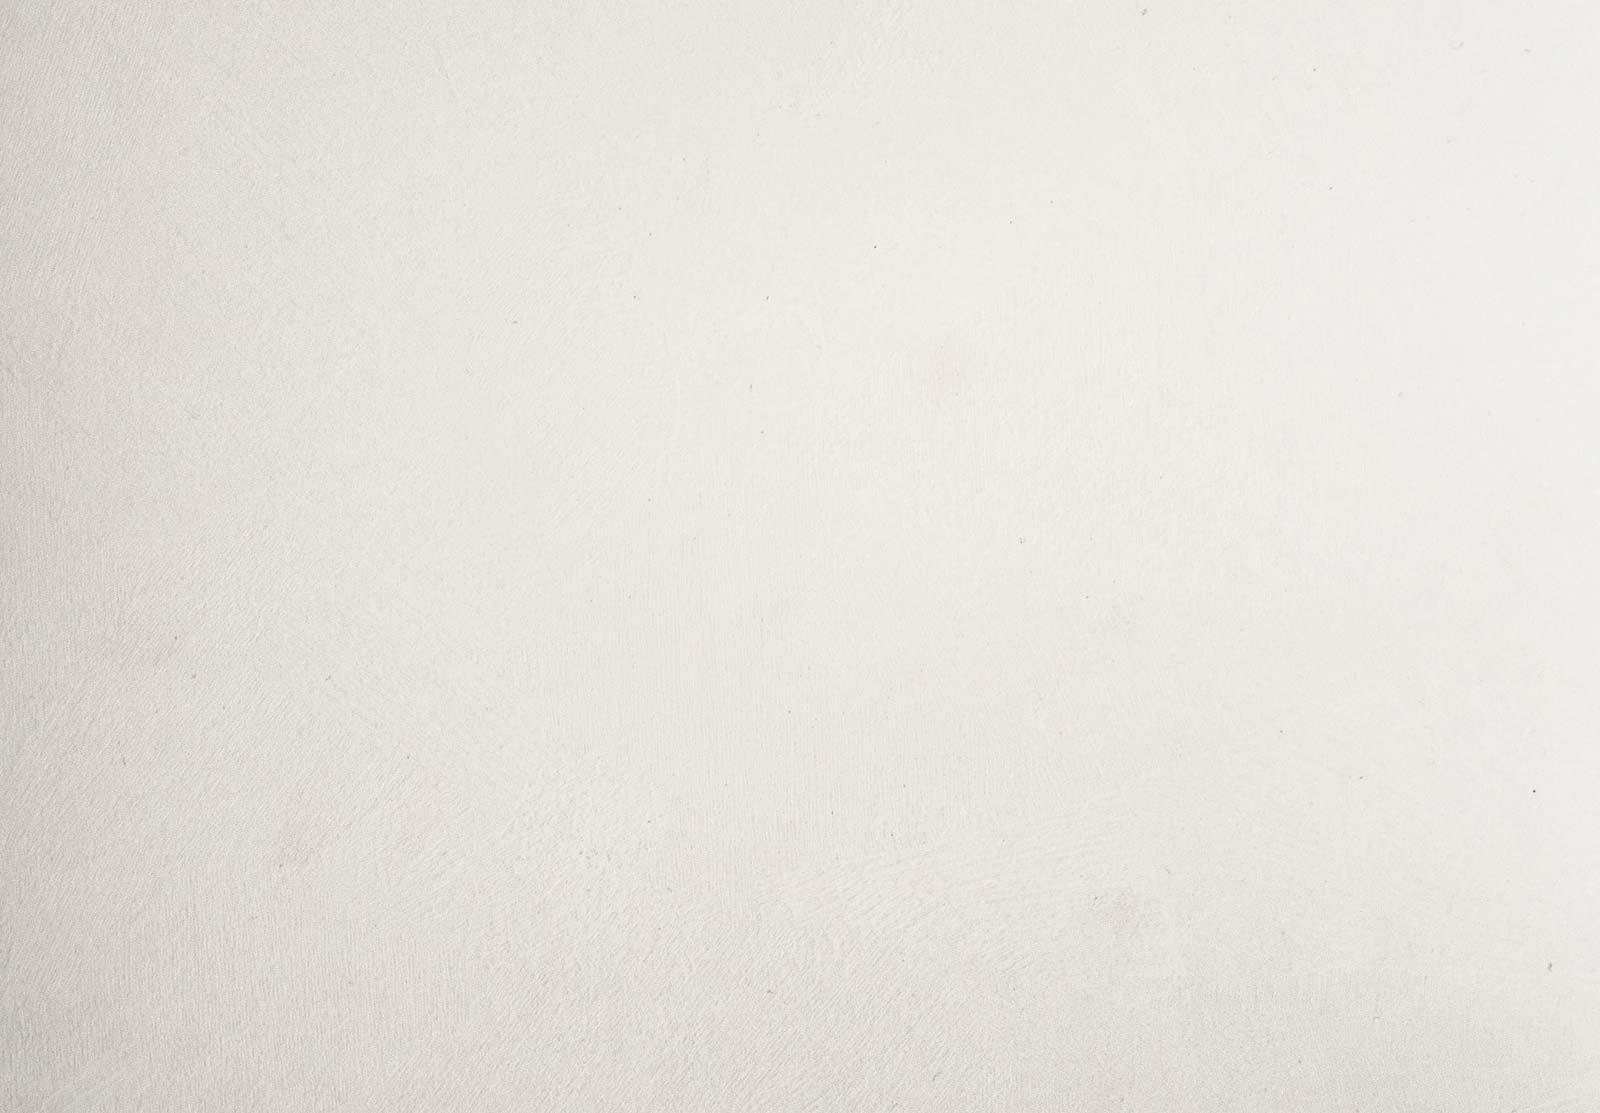 Pannelli alfawood - Bianco 0090